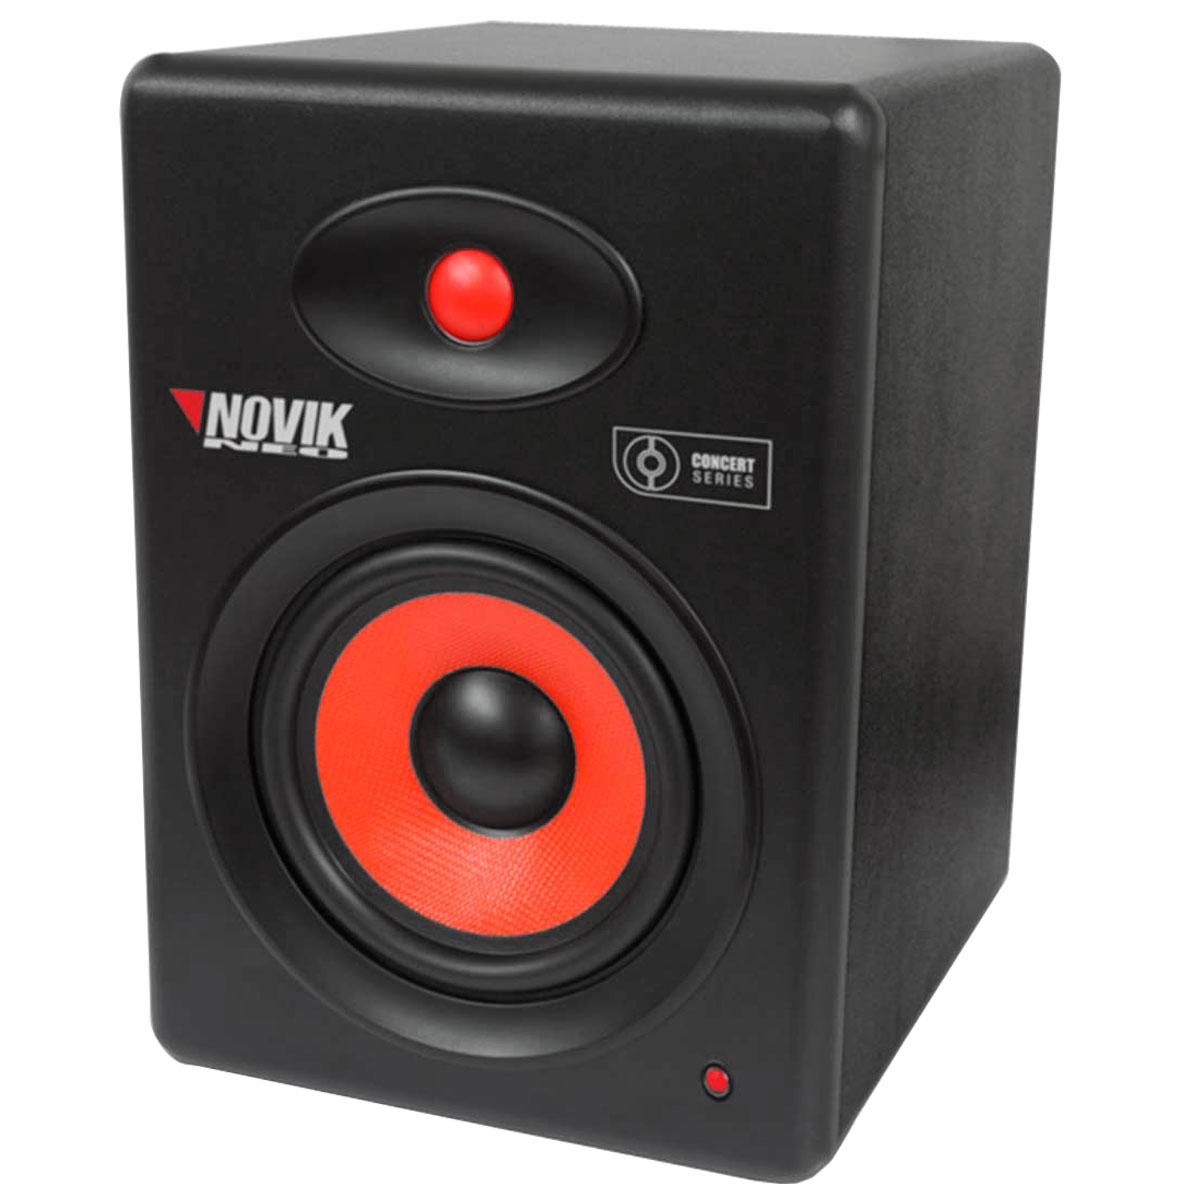 Concert6 - Monitor de Referência 100W Concert 6 - Novik Neo